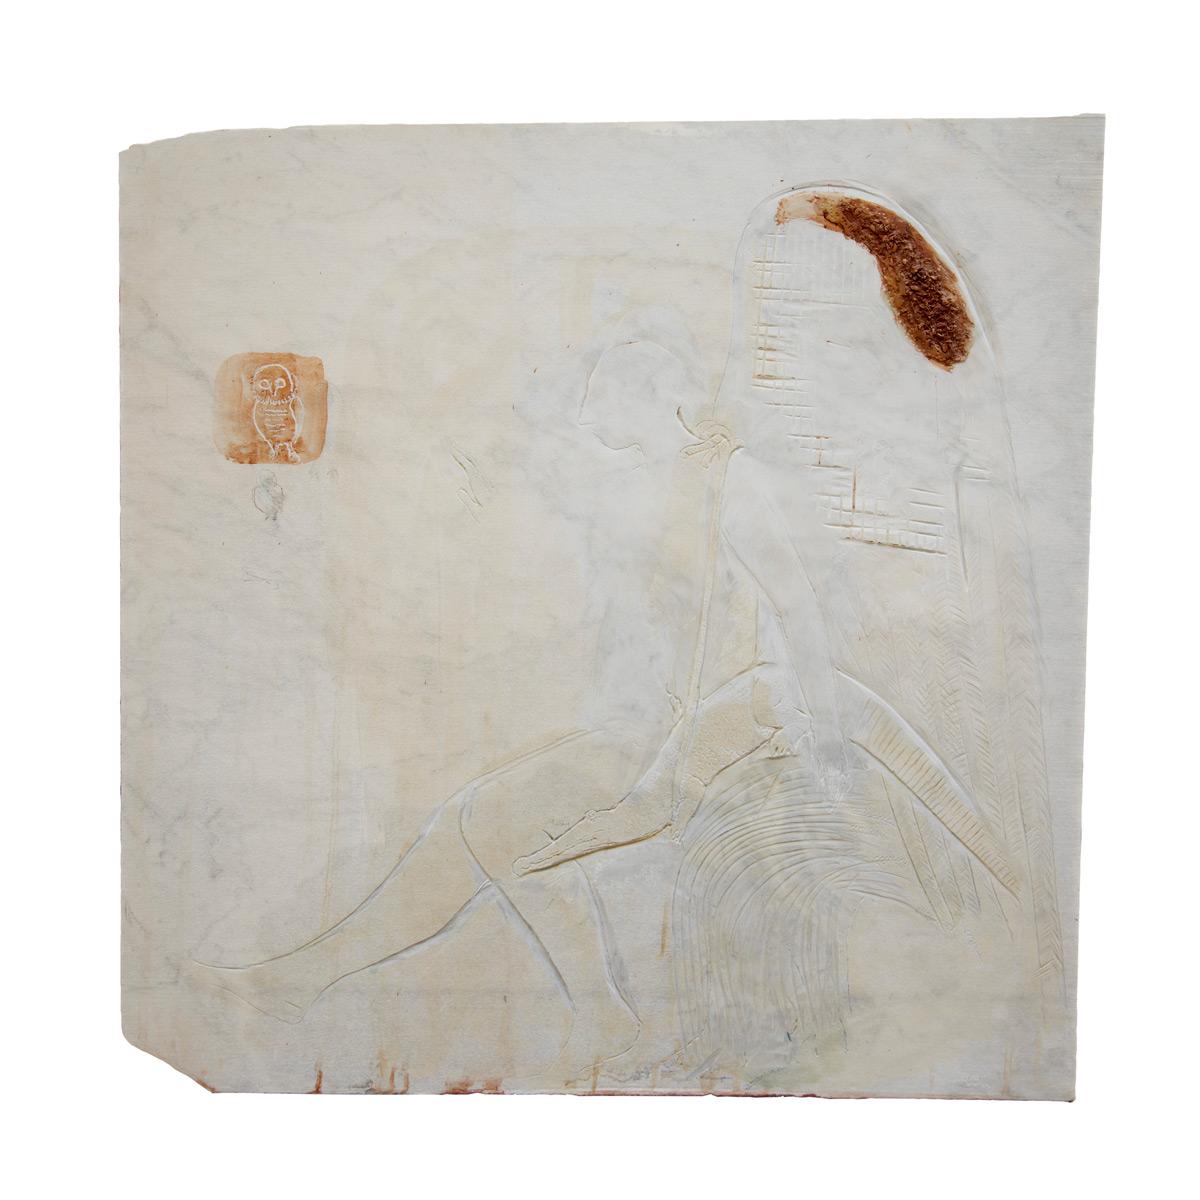 Girolamo-Ciulla-etra-studio-tommasi